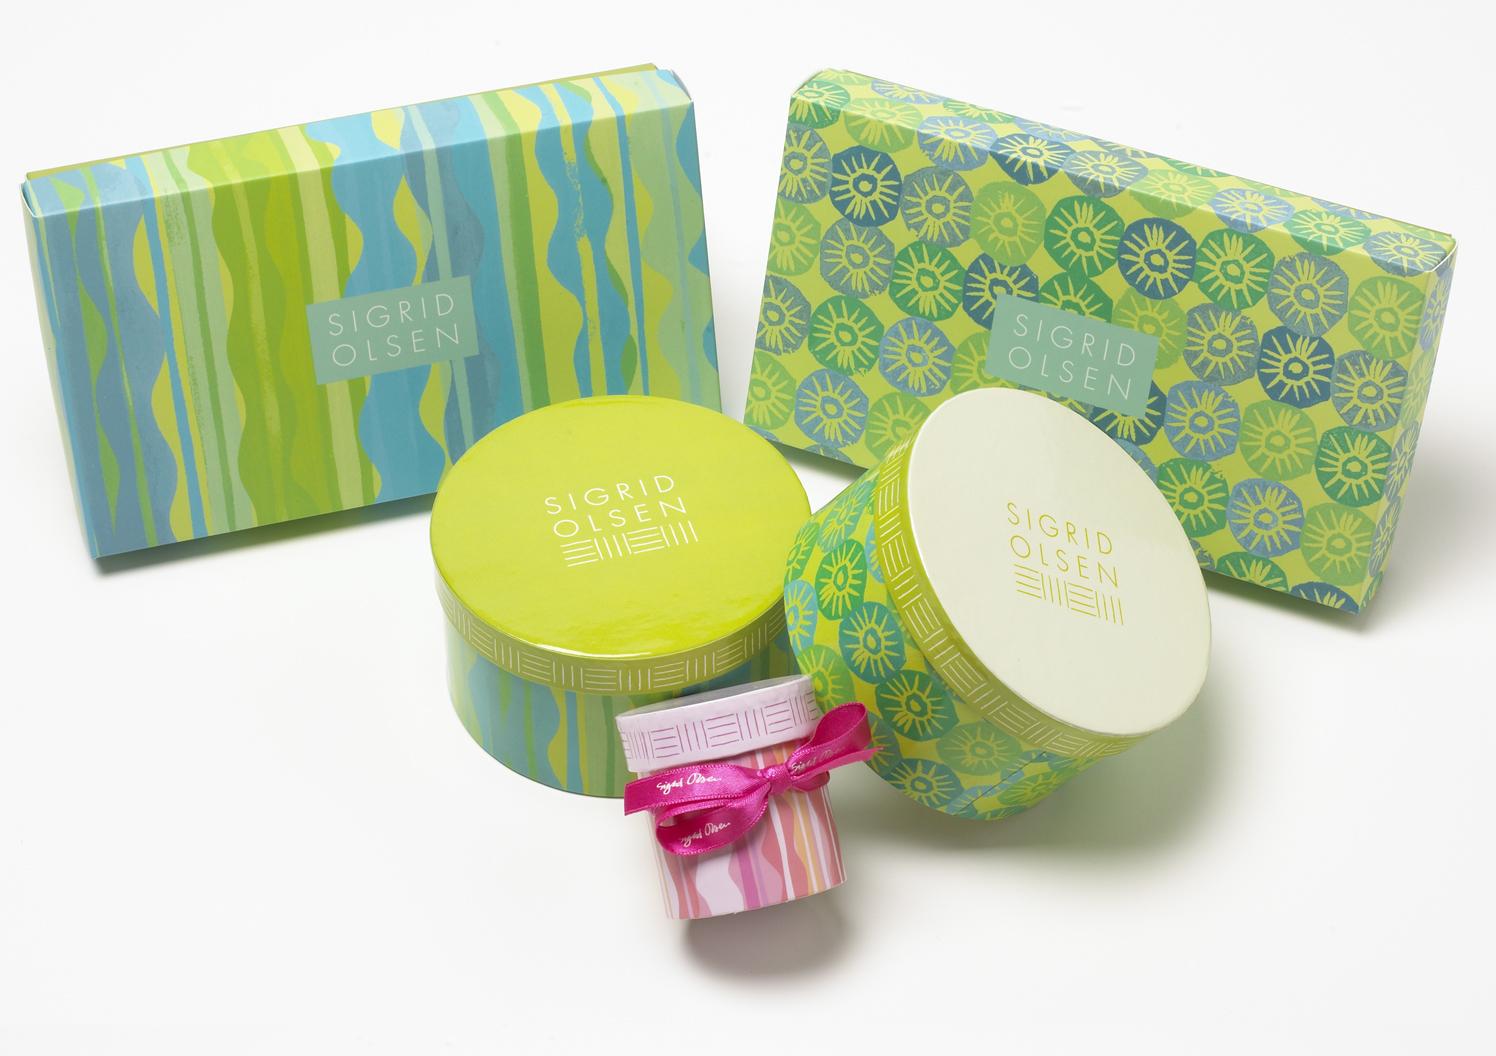 Sigrid Olsen Packaging Program